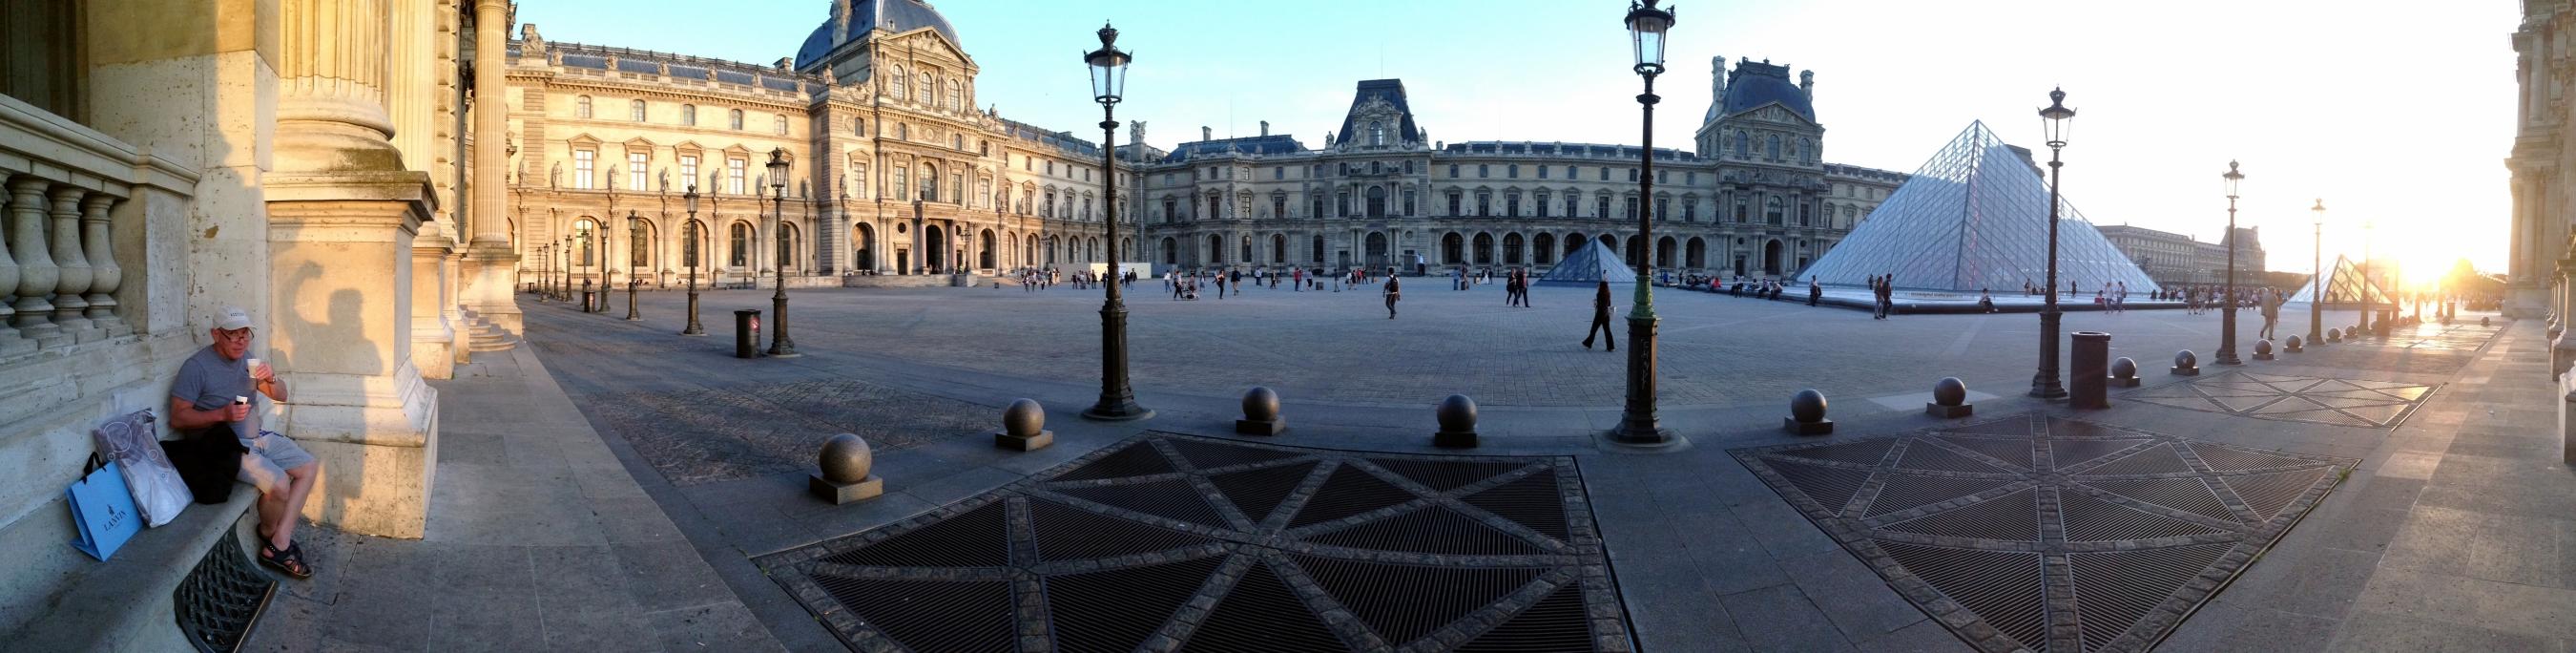 01 Barney Paris louvre panoramic